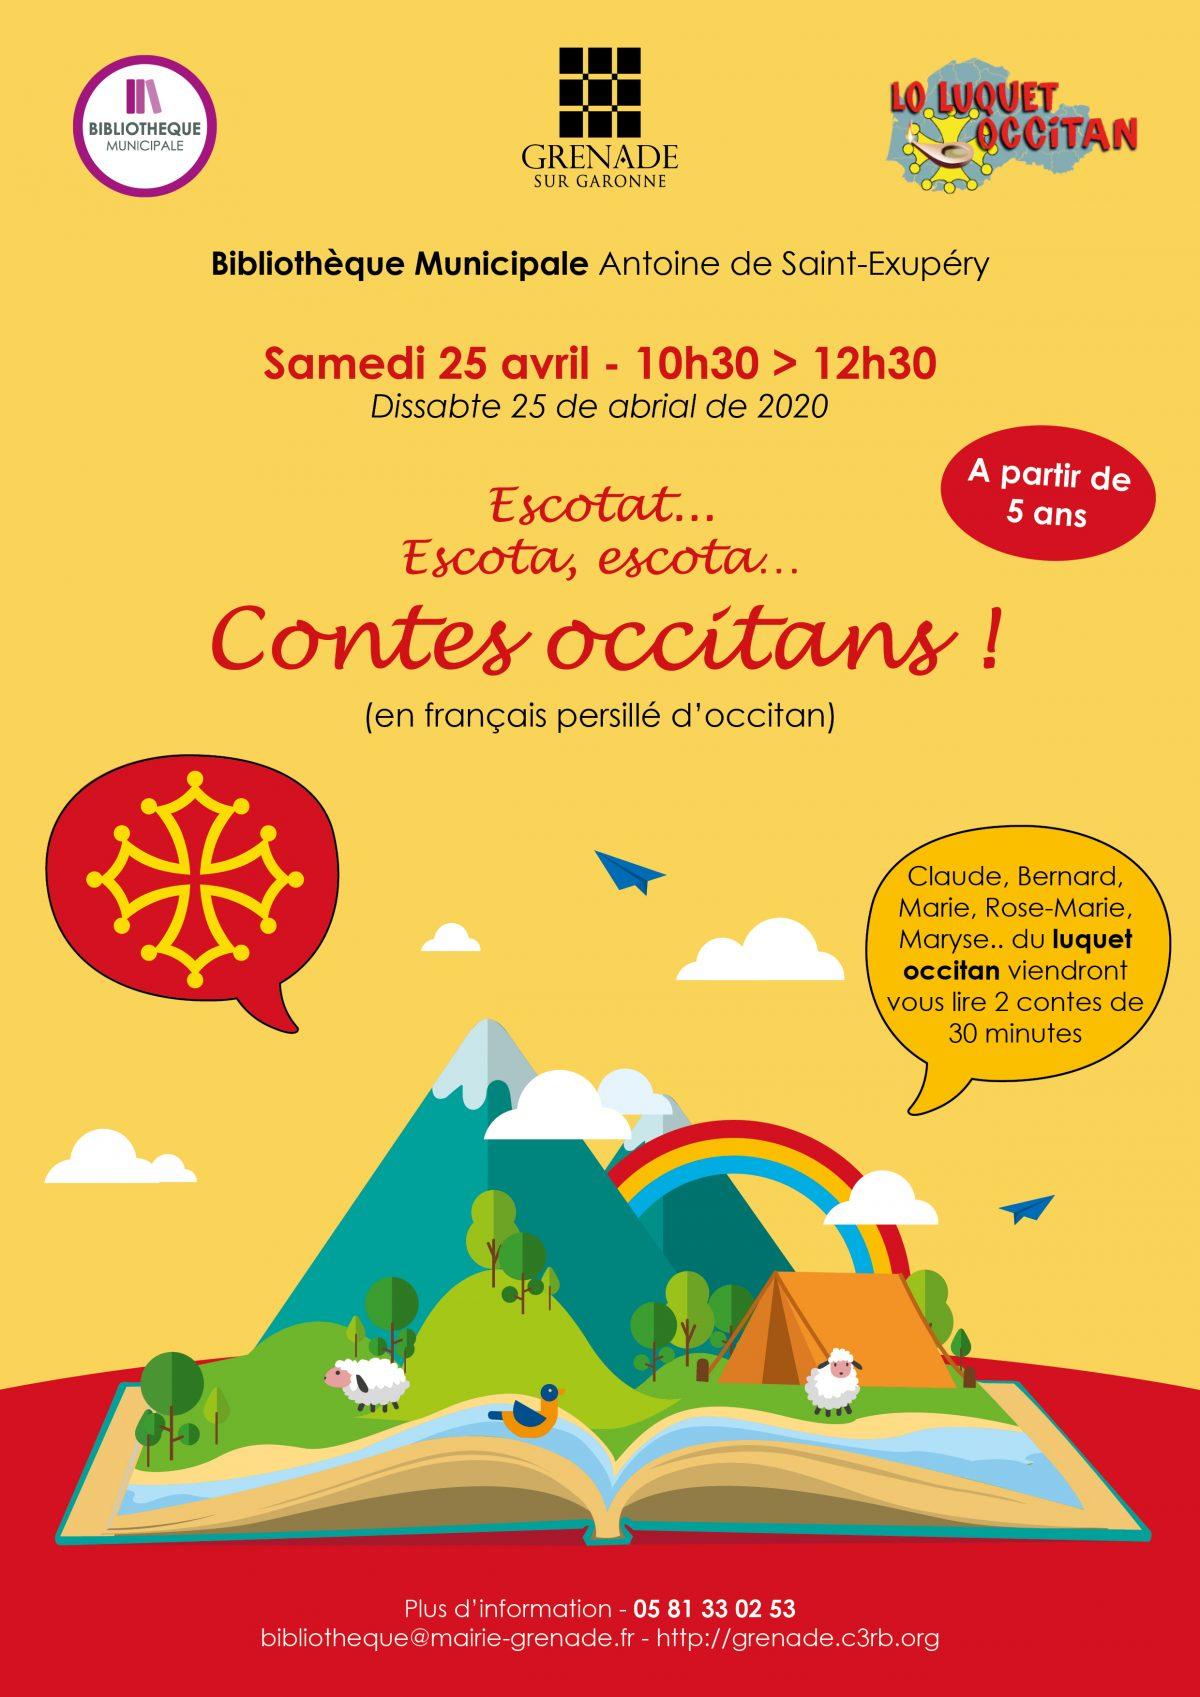 Contes occitans